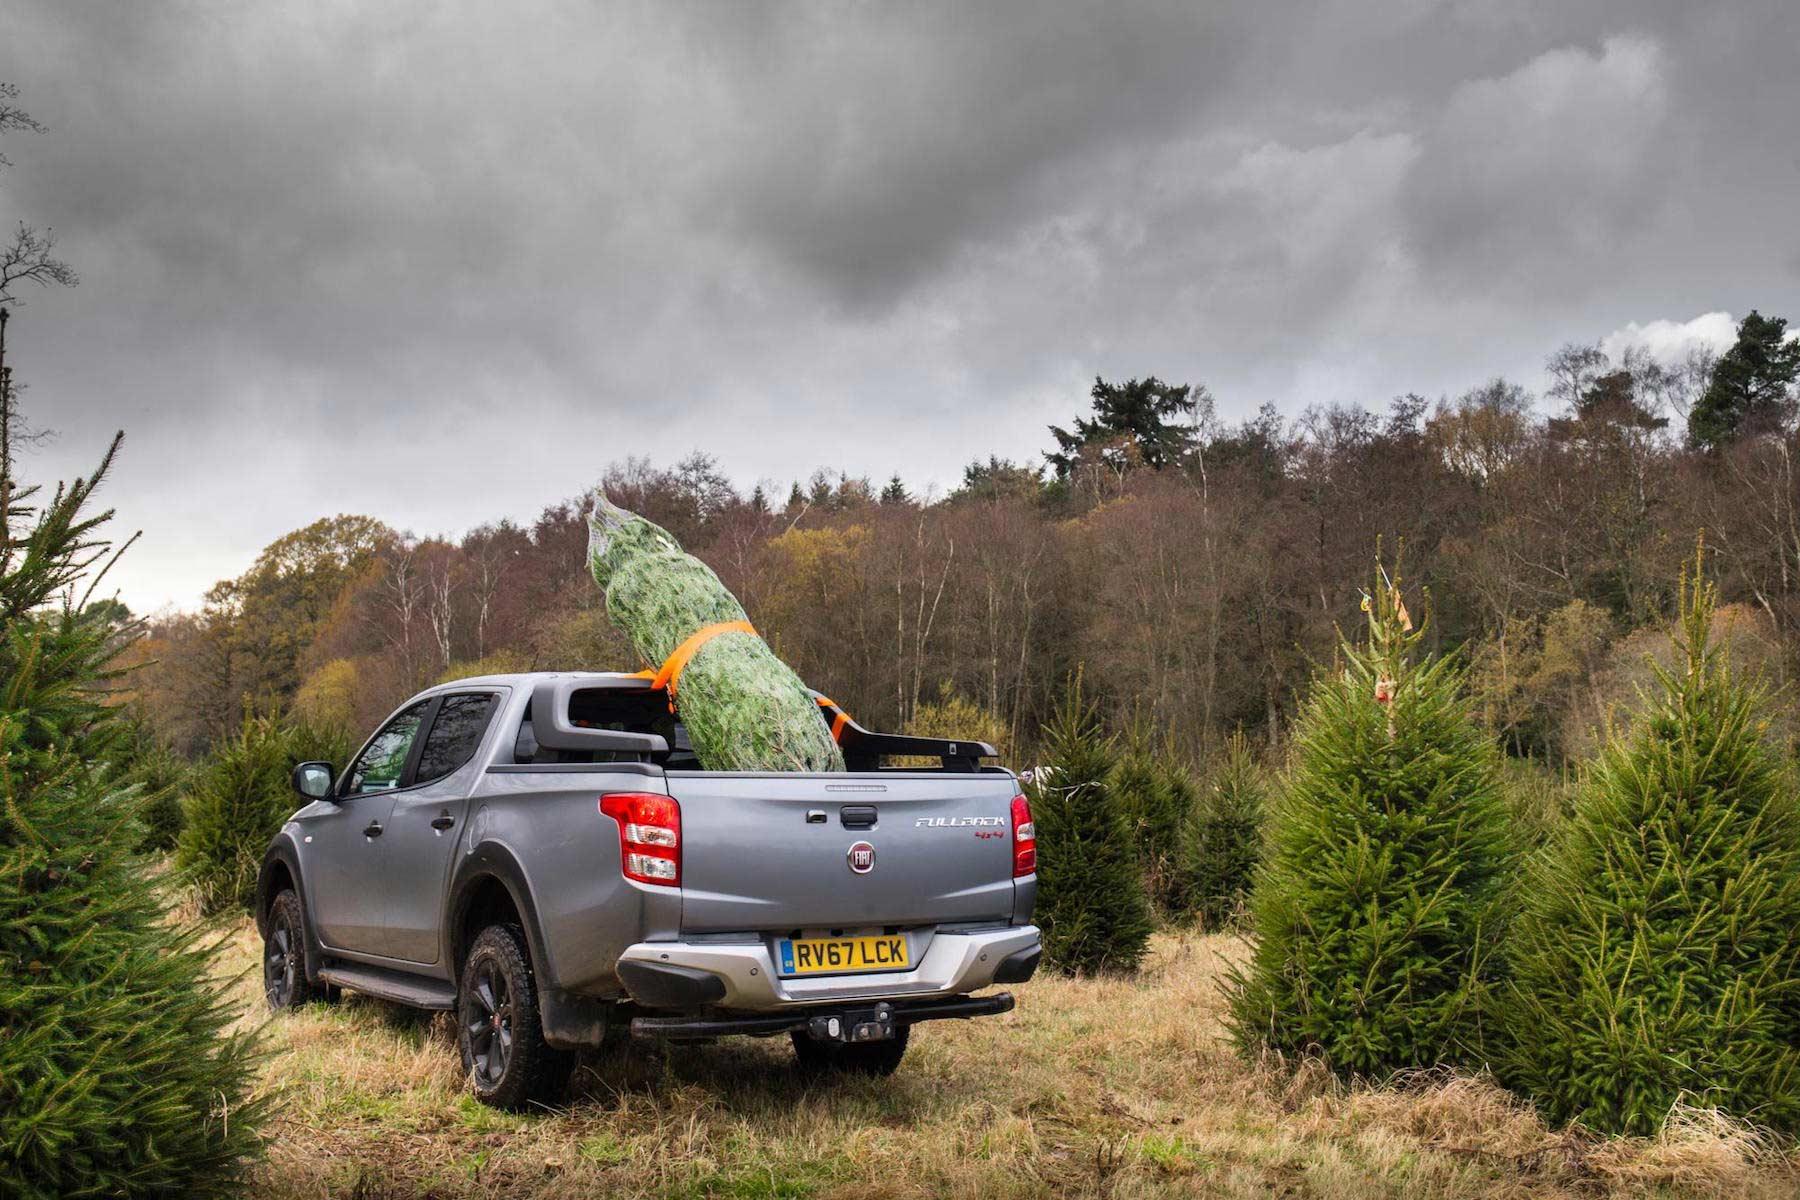 British drivers break law for Christmas tree